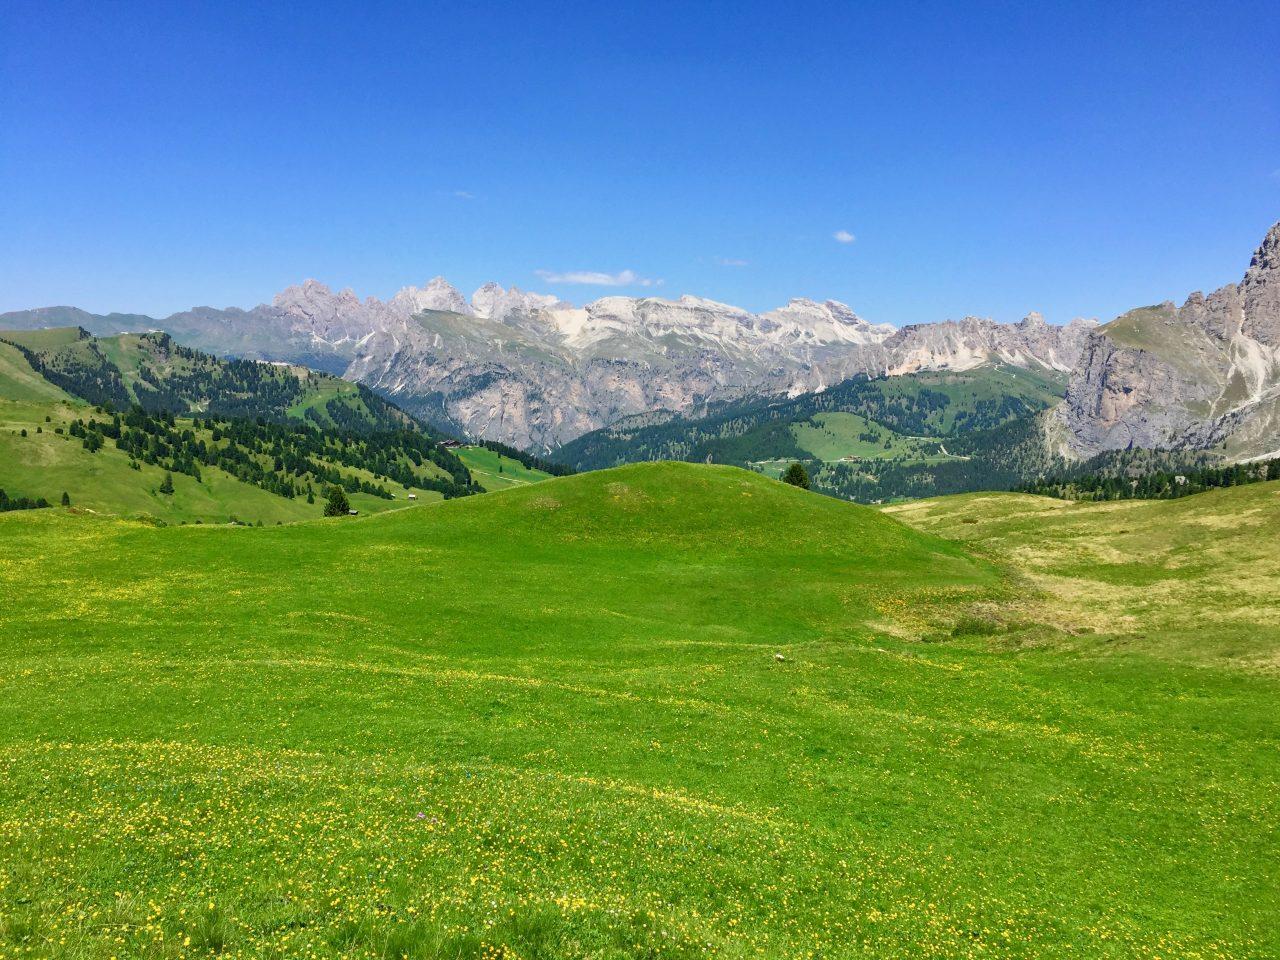 Abfahrt, Passo Sella, Dolomites, Italy